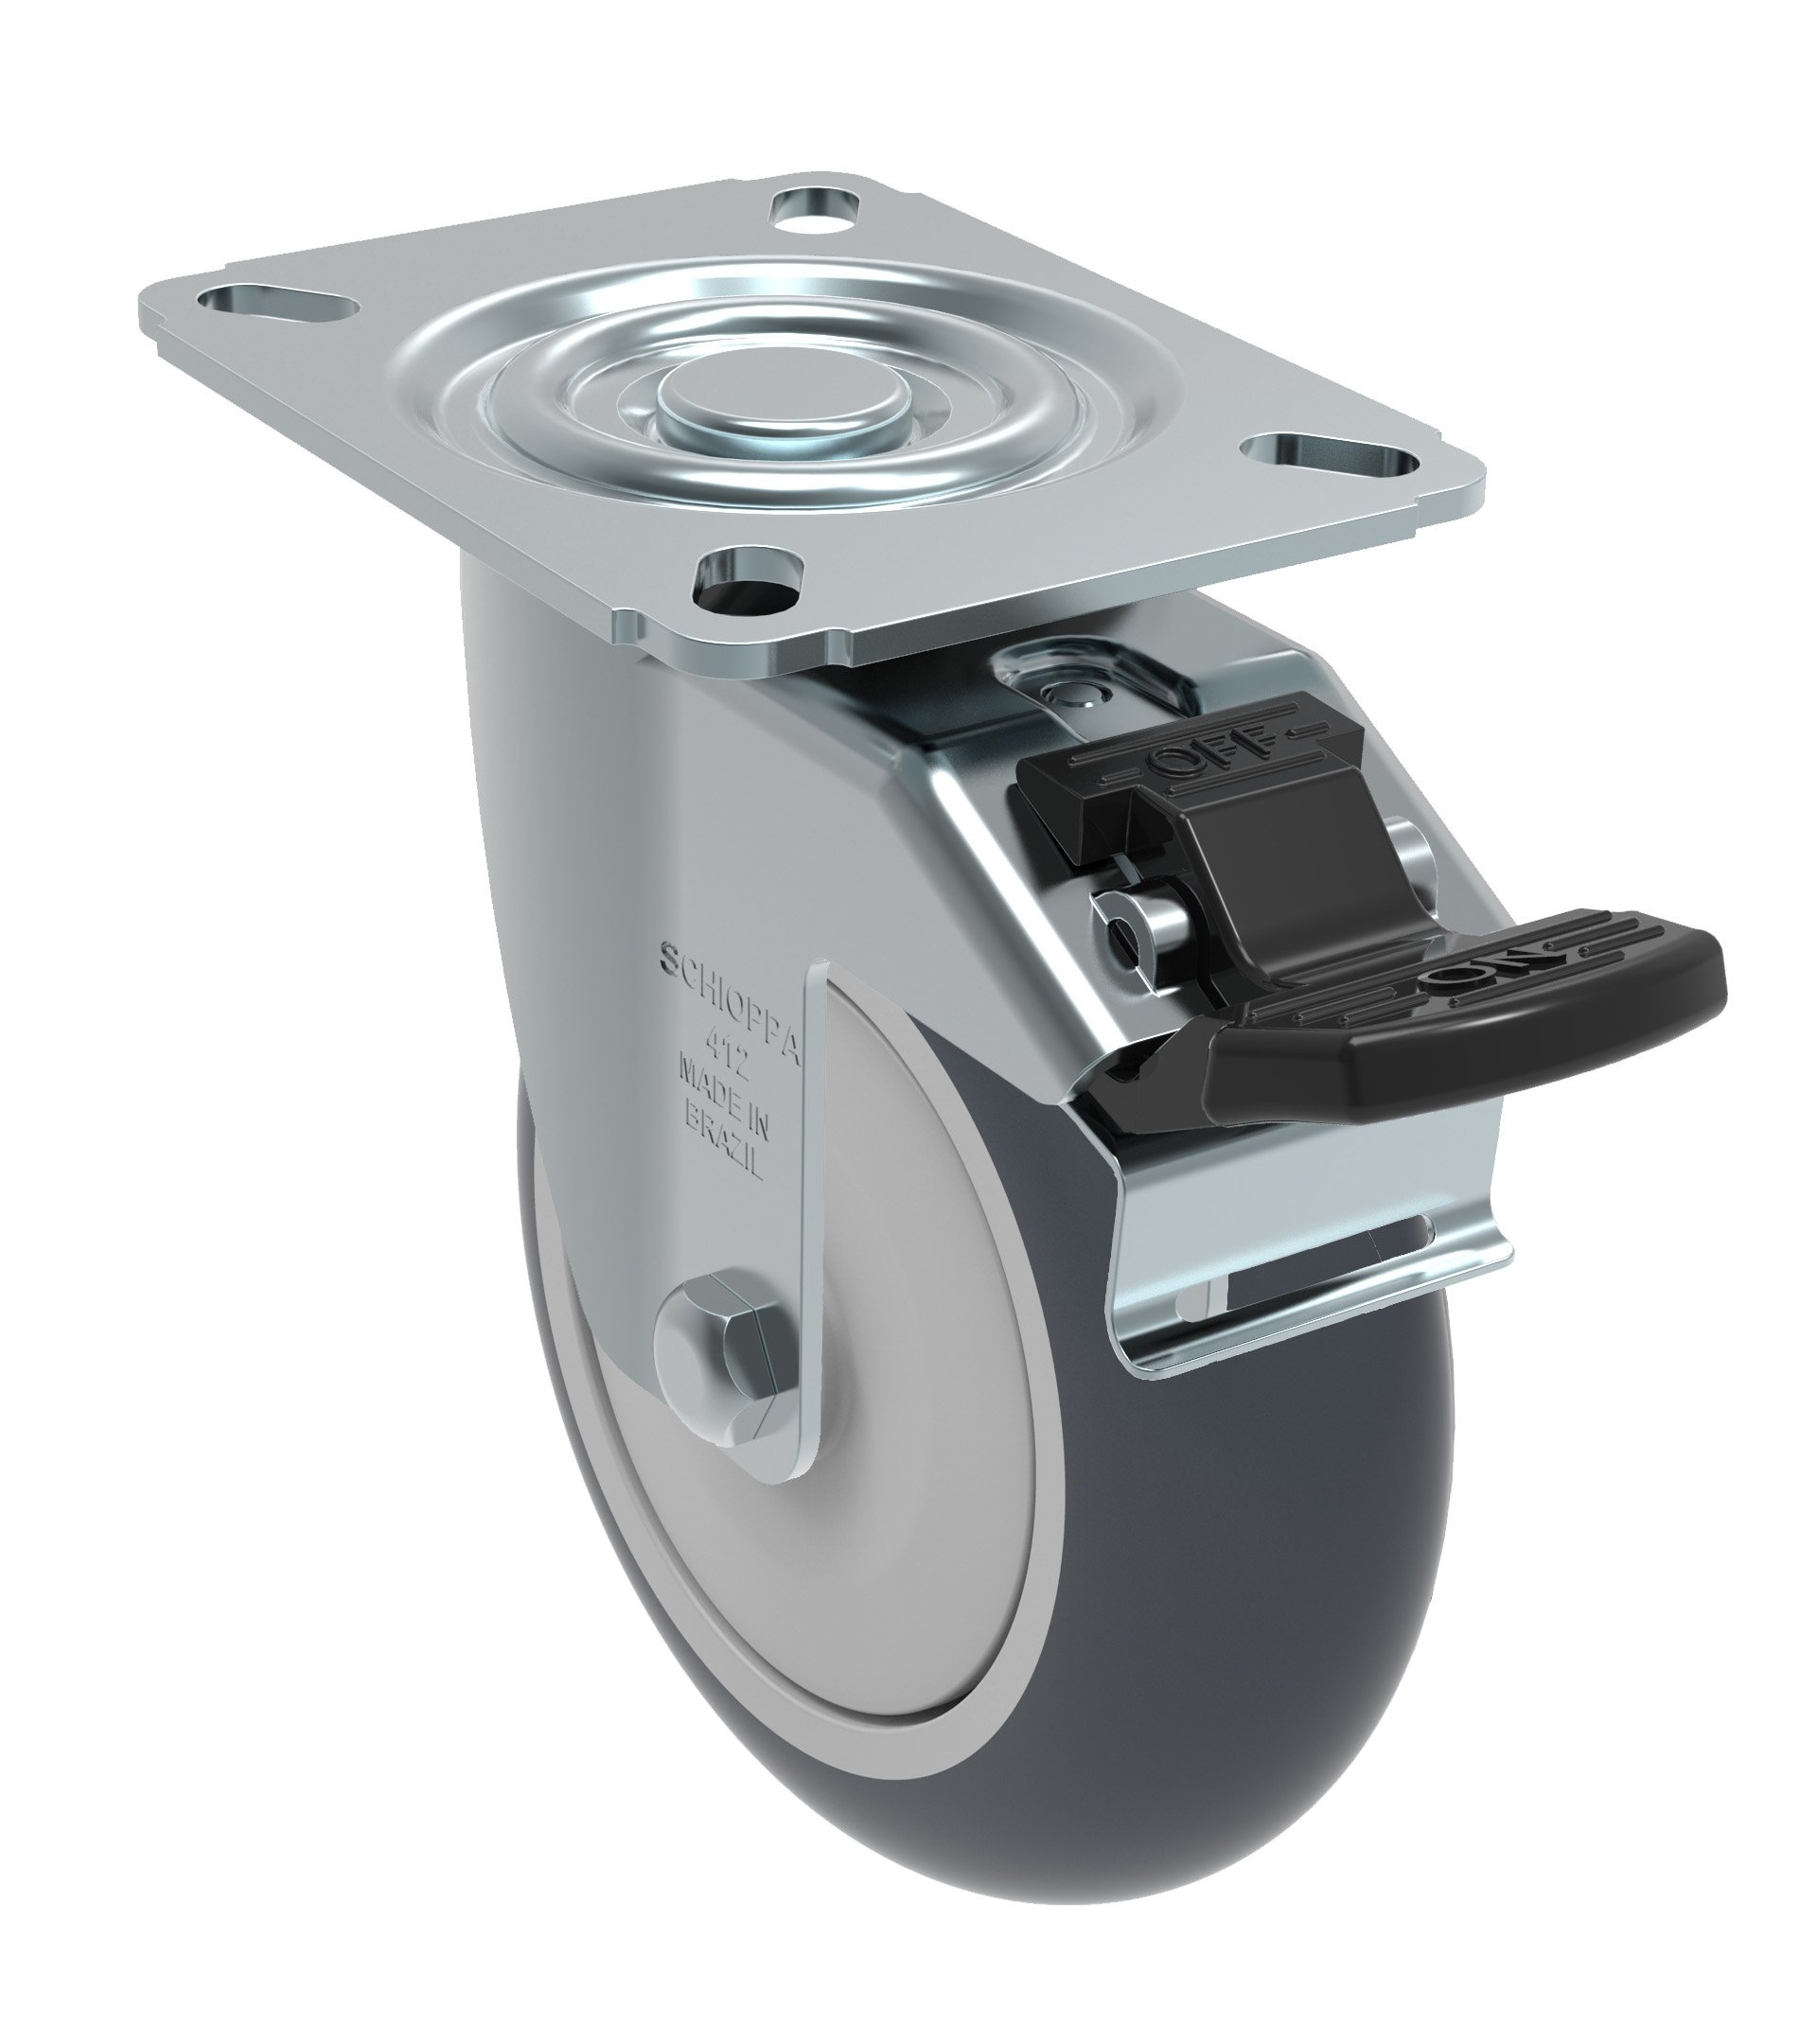 Schioppa GL 412 TBE G L12 Series 4'' x 1-1/4'' Diameter Swivel Caster with Total Lock Brake, Non-Marking Thermoplastic Rubber Precision Ball Bearing Wheel, Plate 3-1/8'' x 4-1/8'' (Bolt Holes 3-1/8'' x 2-1/4''), 220 lb